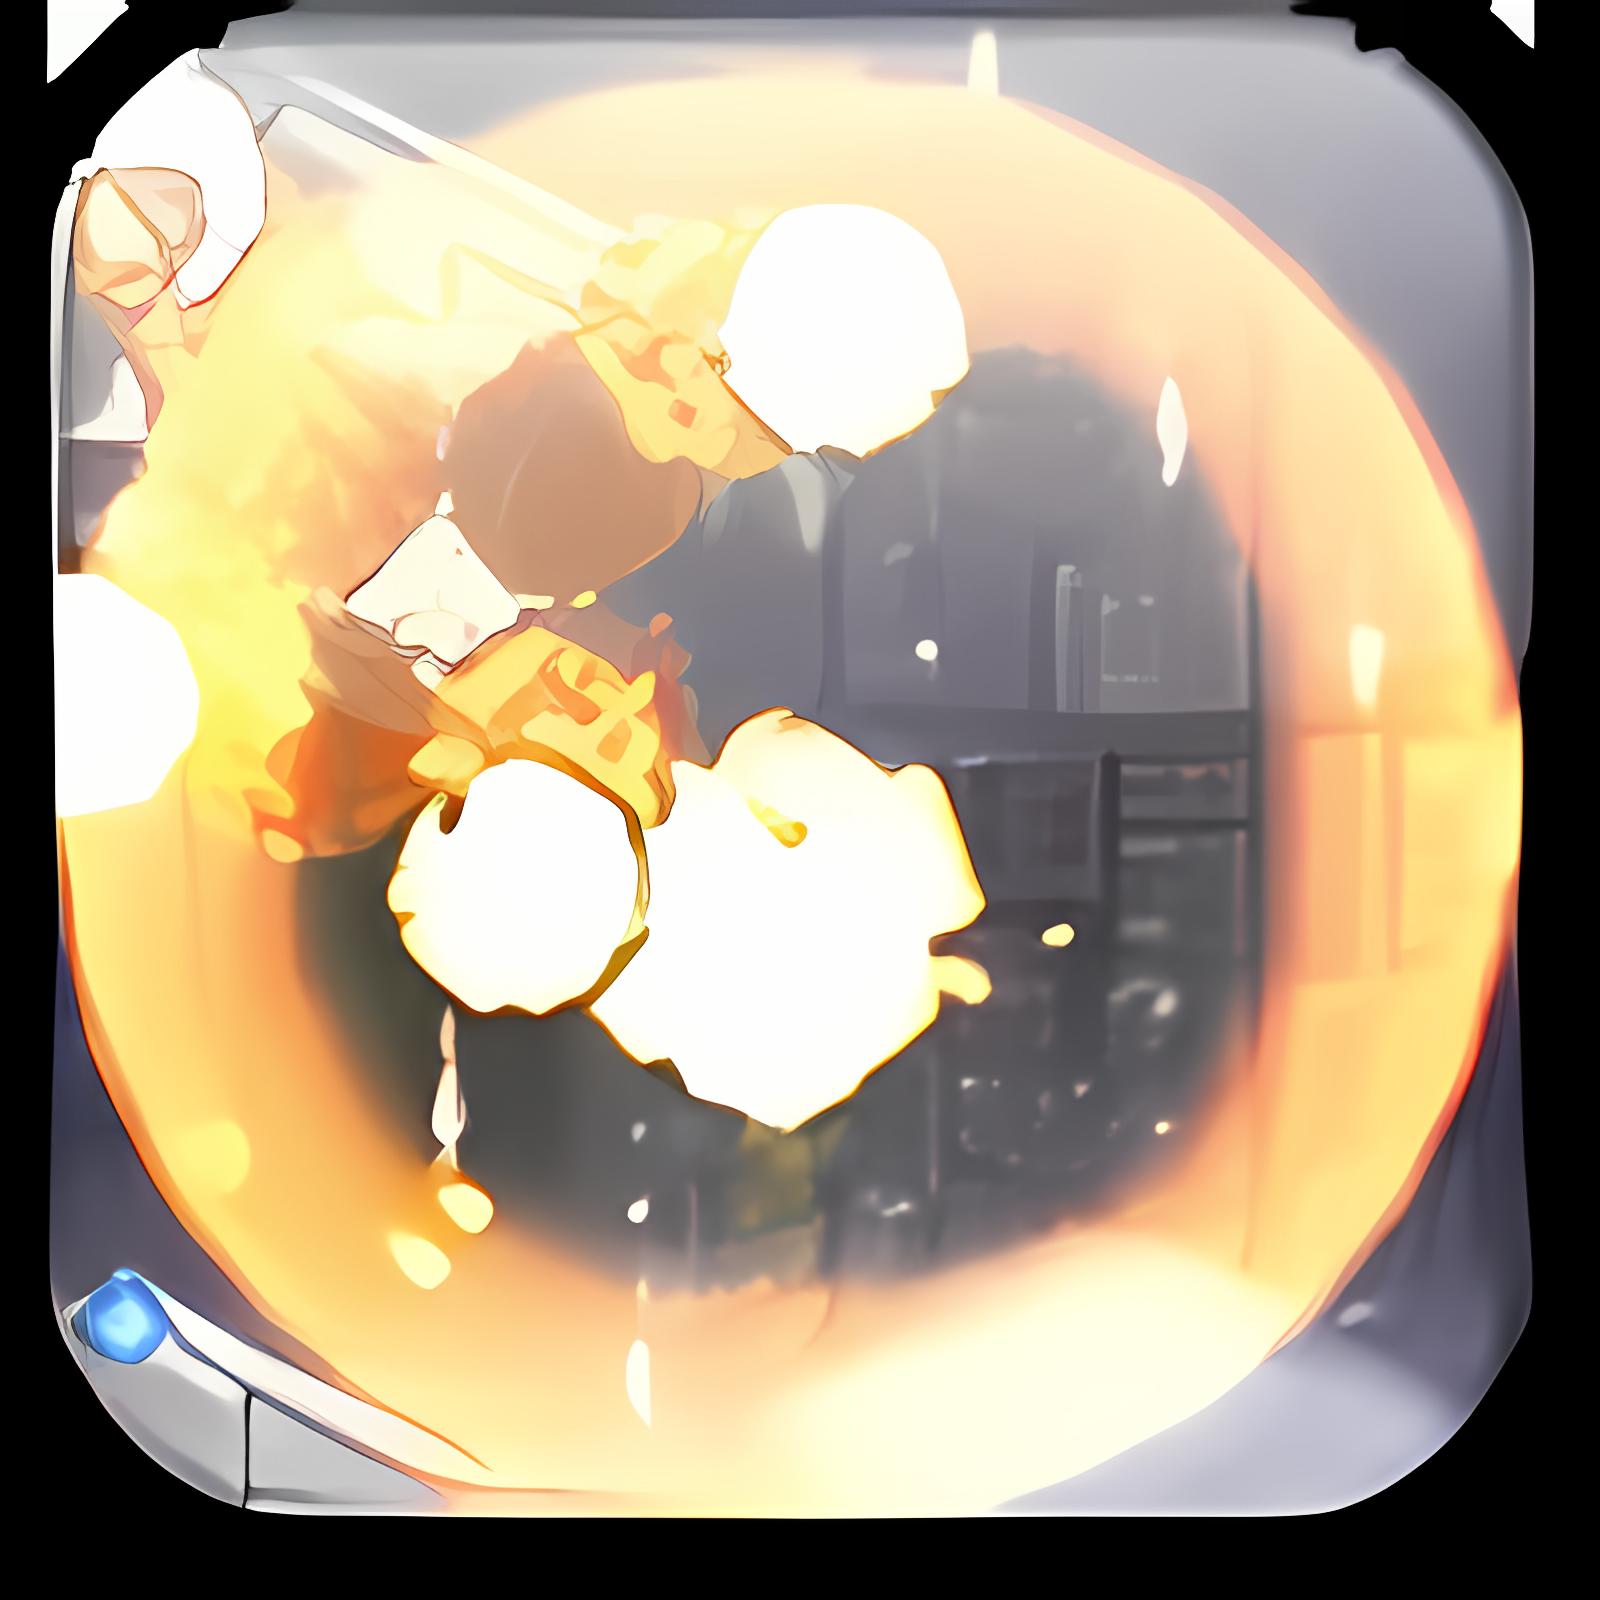 Sonic Ironstorm: Fatal Attack